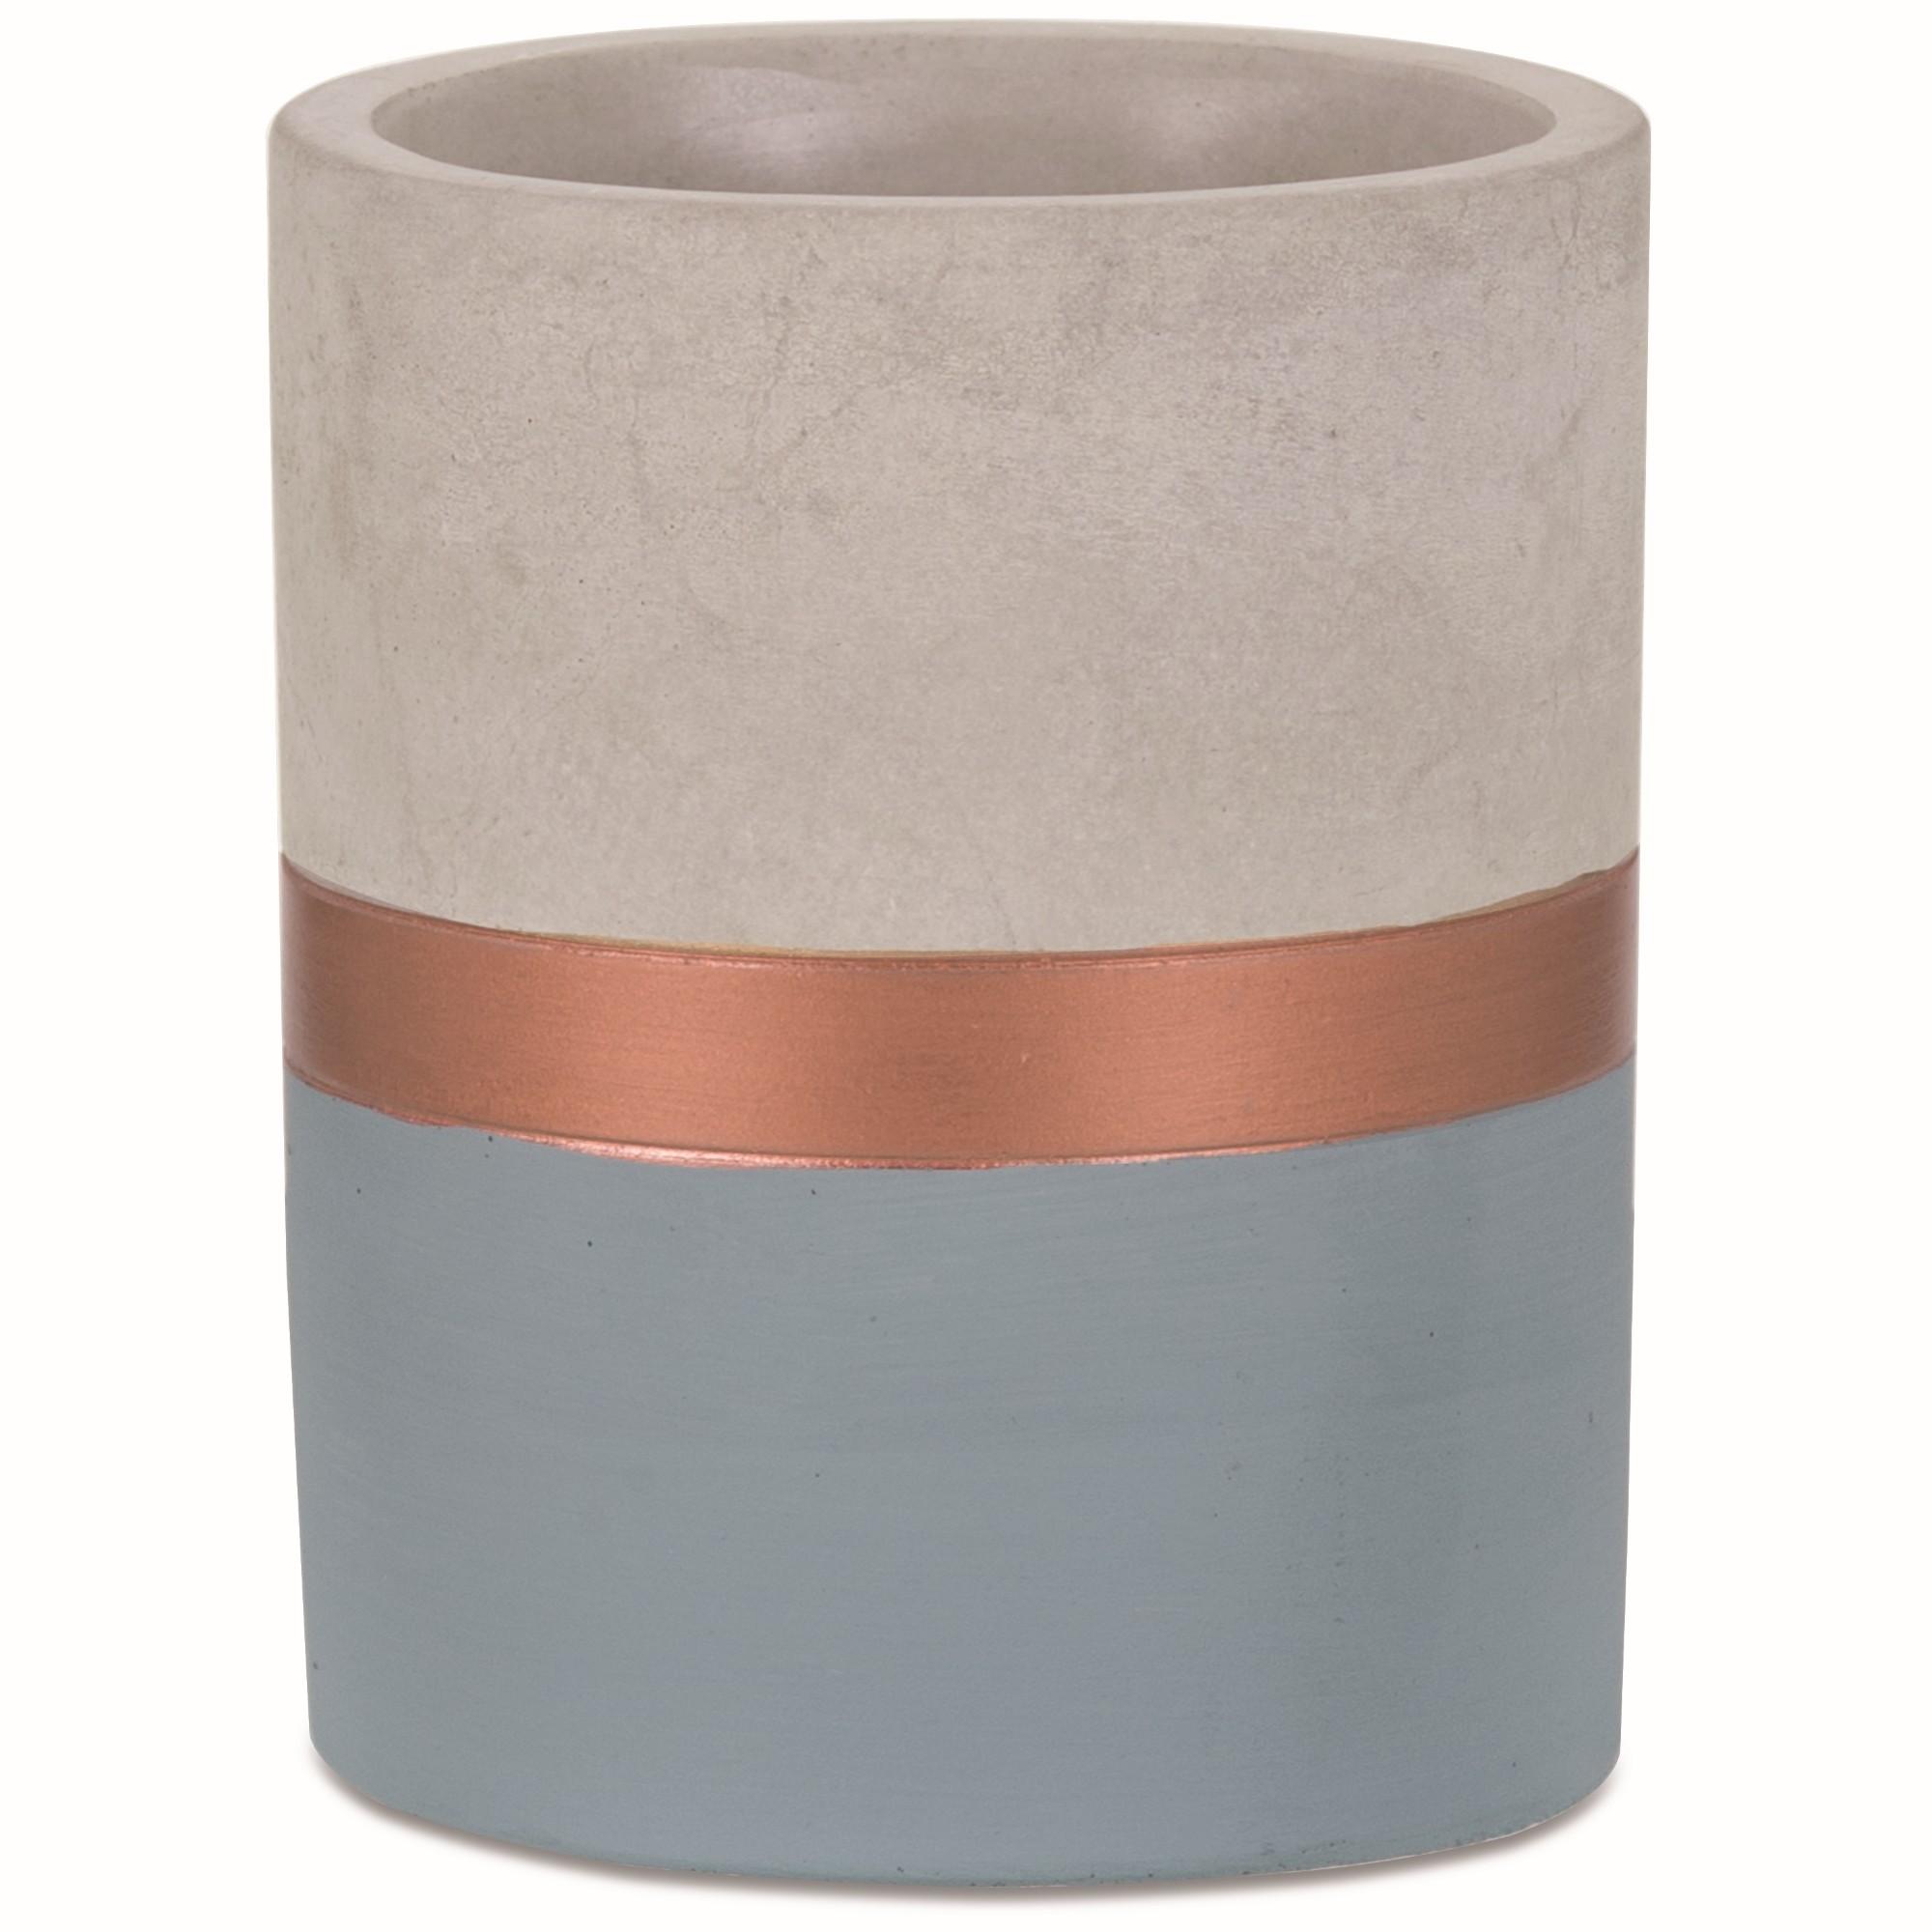 Vaso Decorativo Cimento 9cm Redondo 7707 - Mart